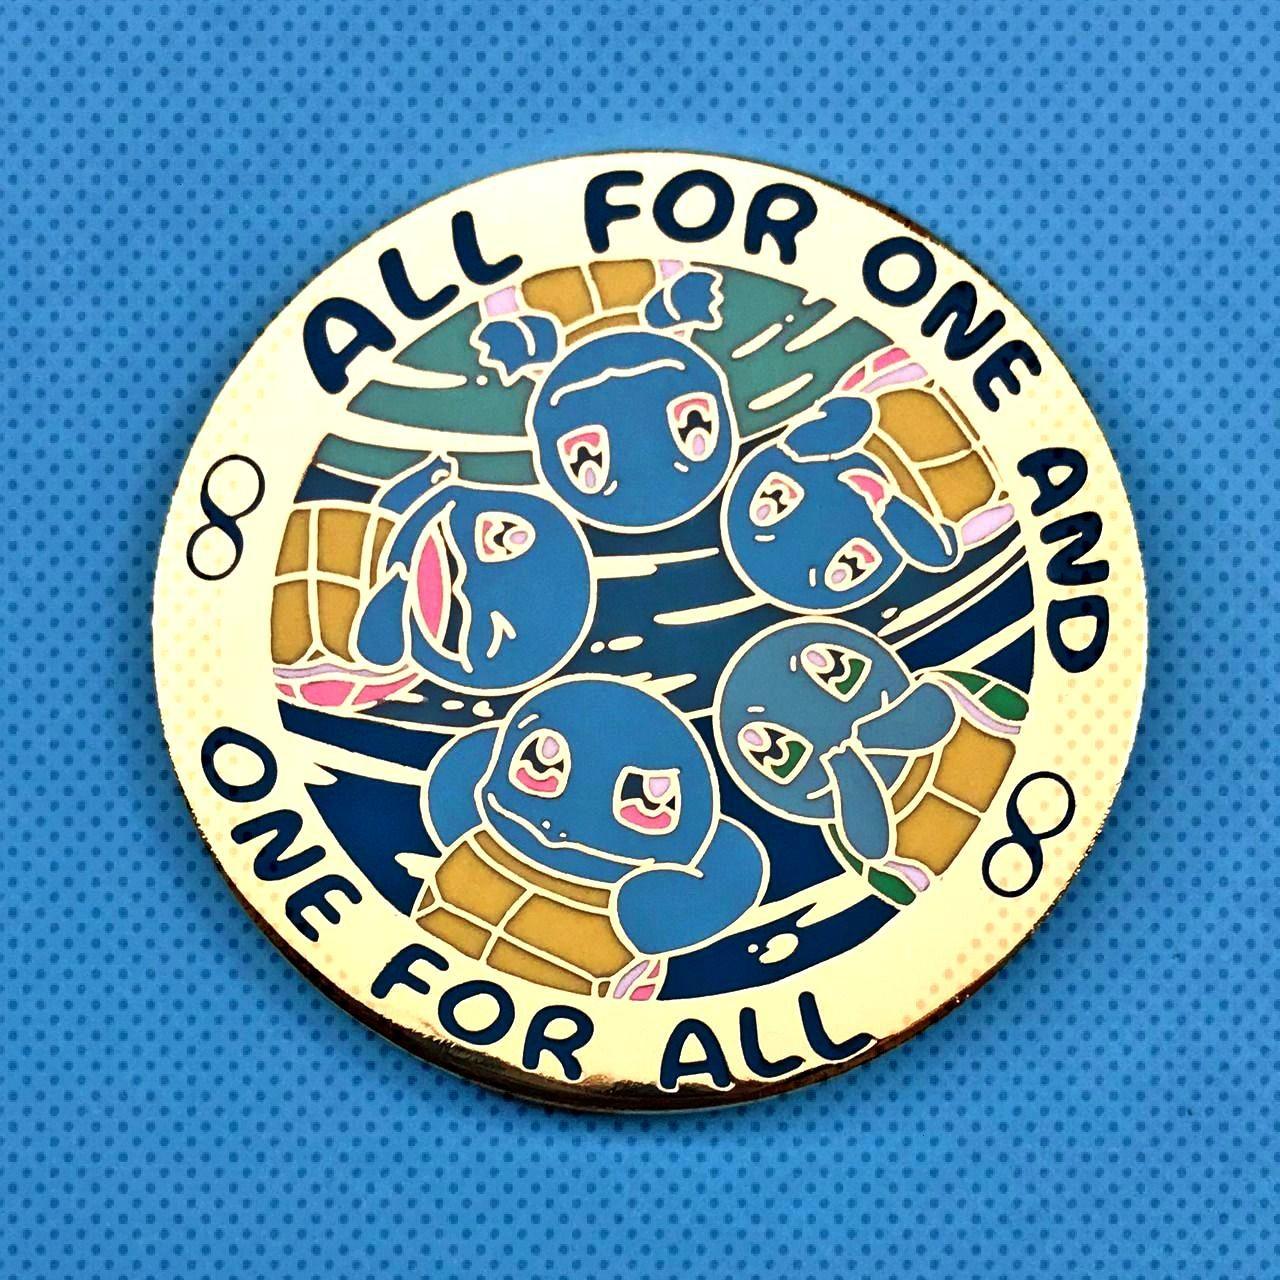 Kanto Starter Pokemon Pins made by KdeKevin -